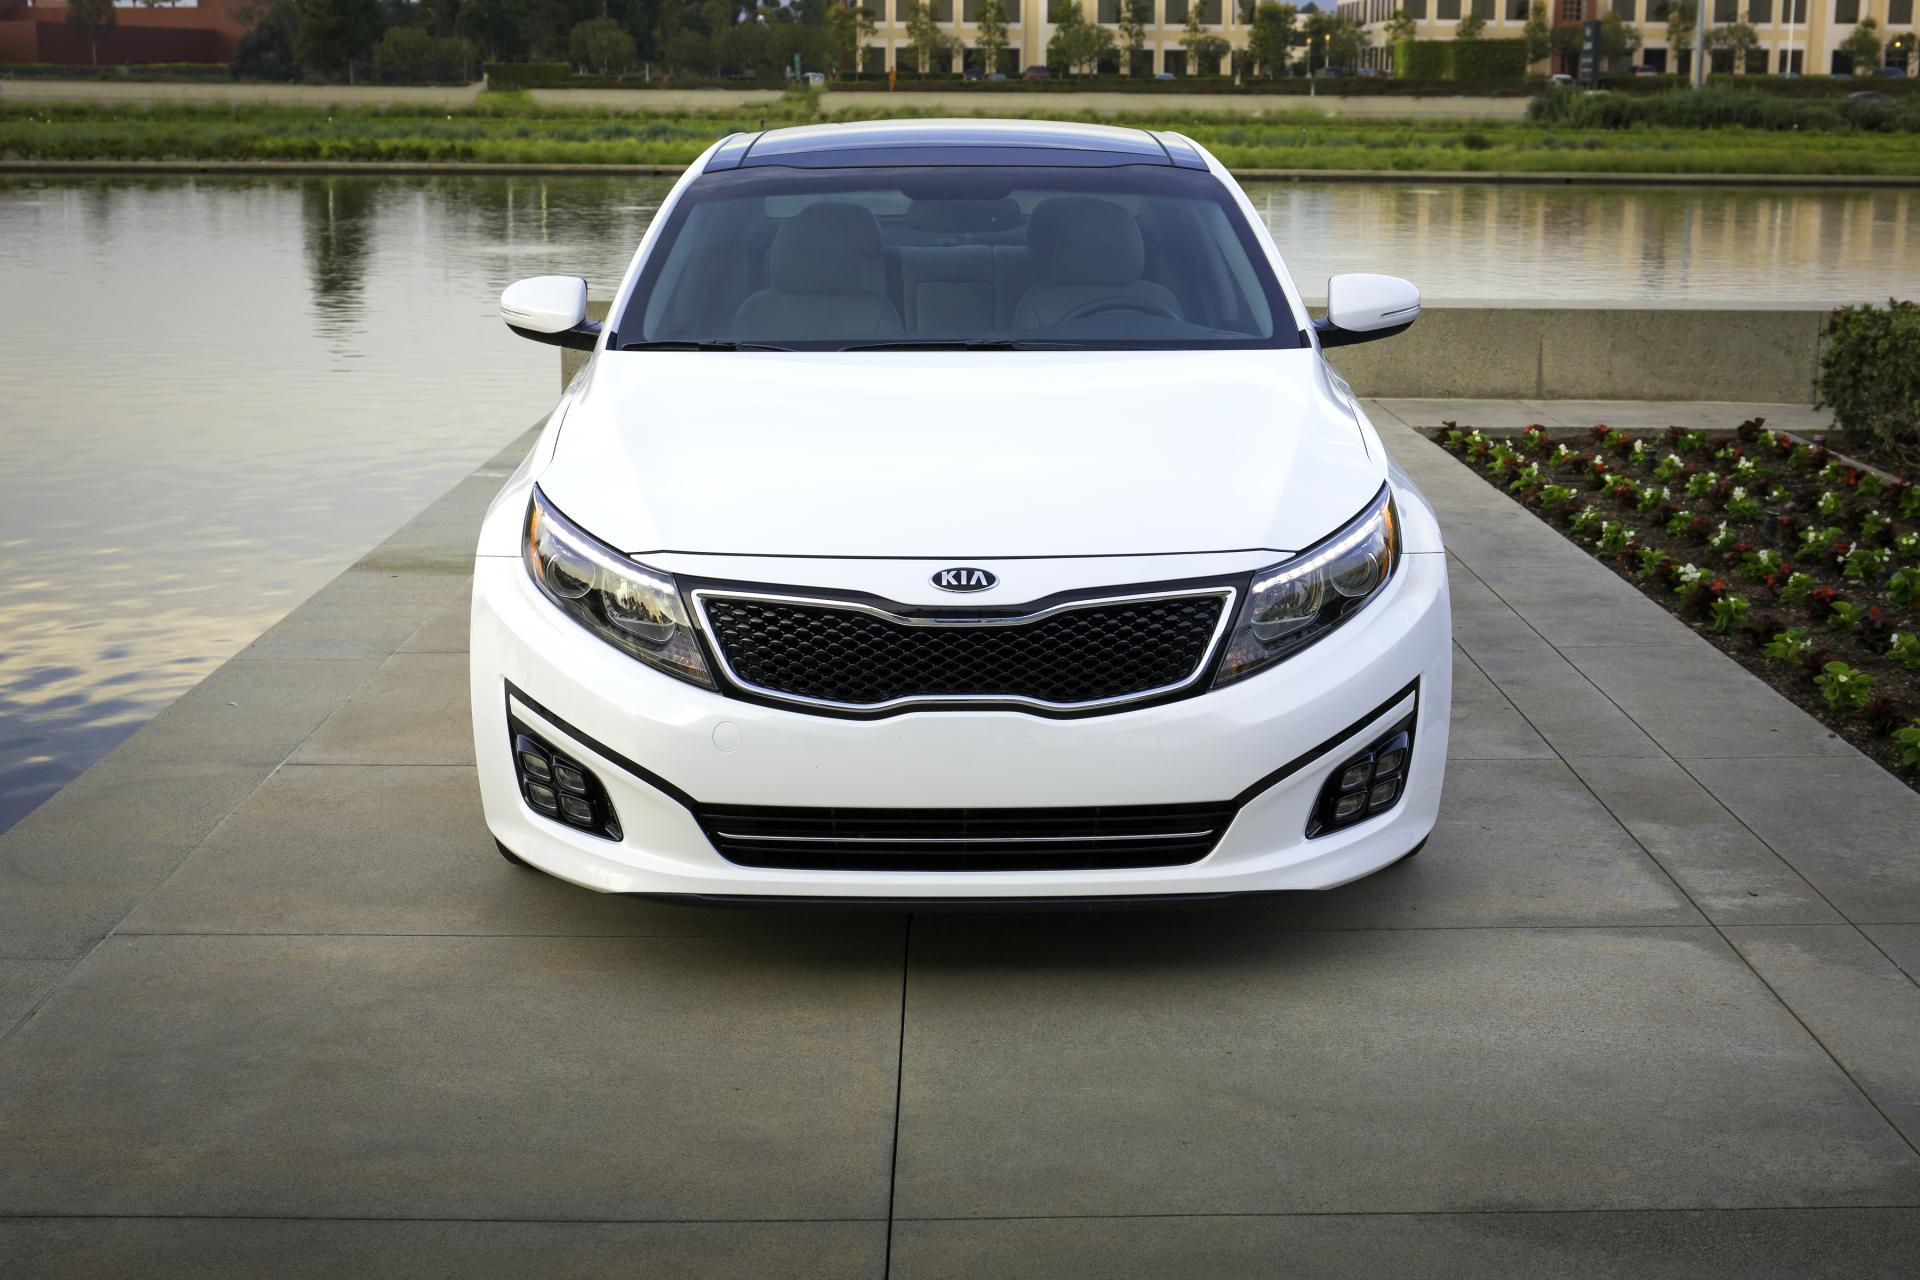 of motor unique features ex first test interior trend lx kia featureskia beautiful optima